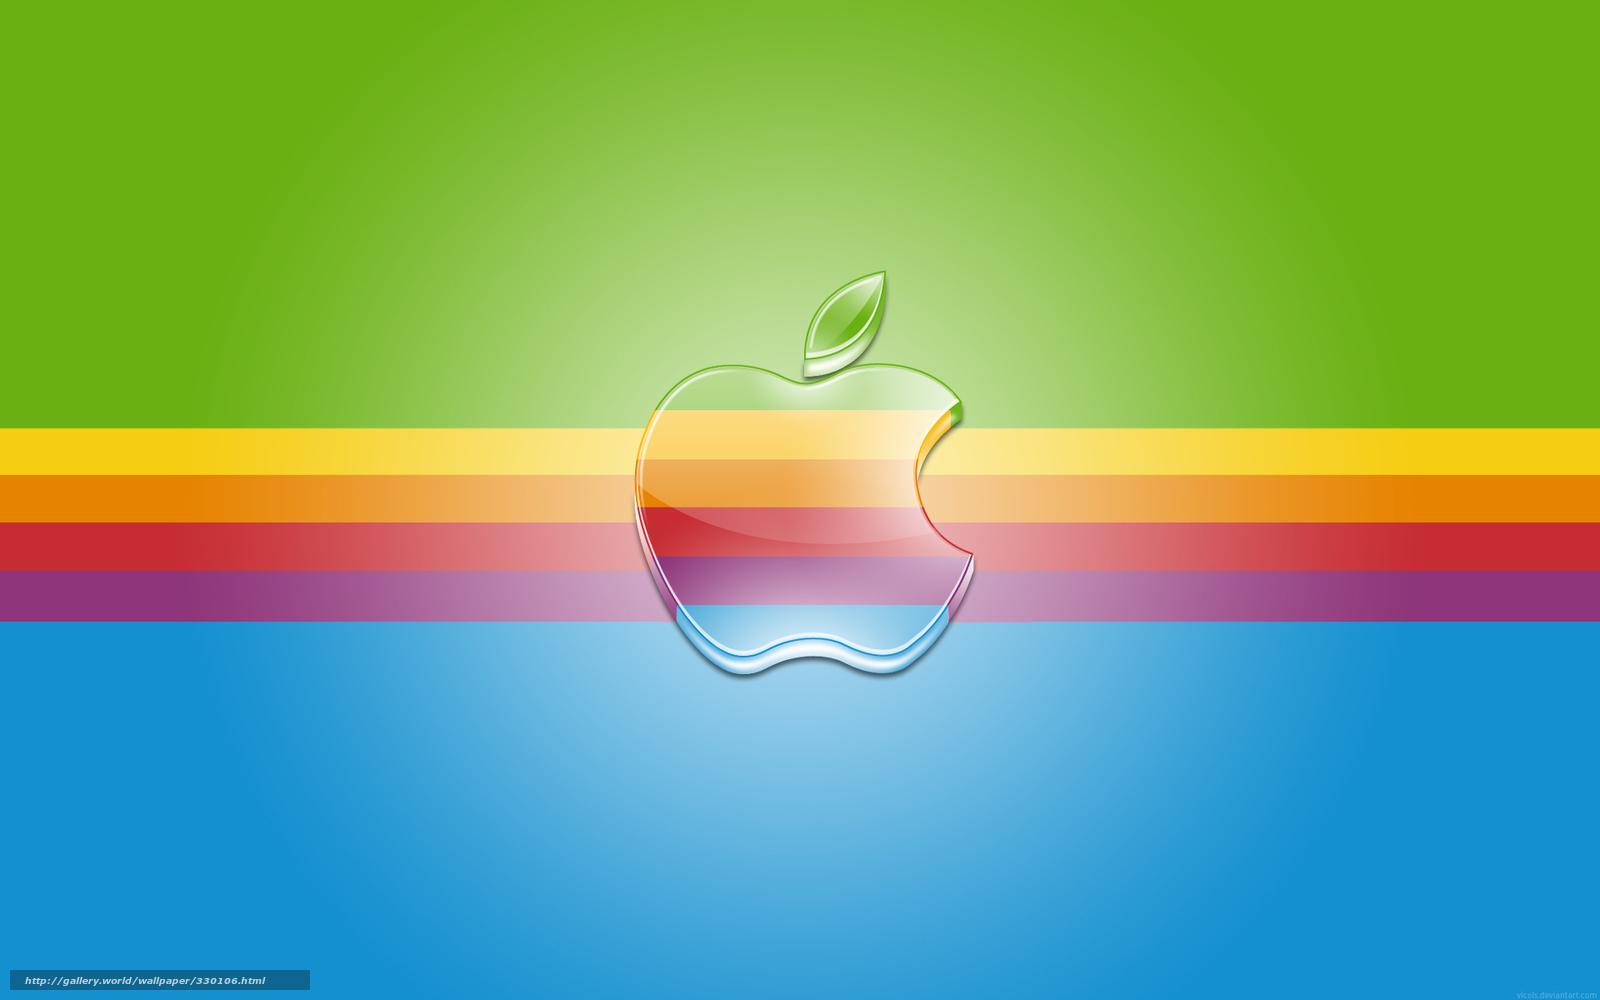 Download Wallpaper Rainbow Band Logo Free Desktop